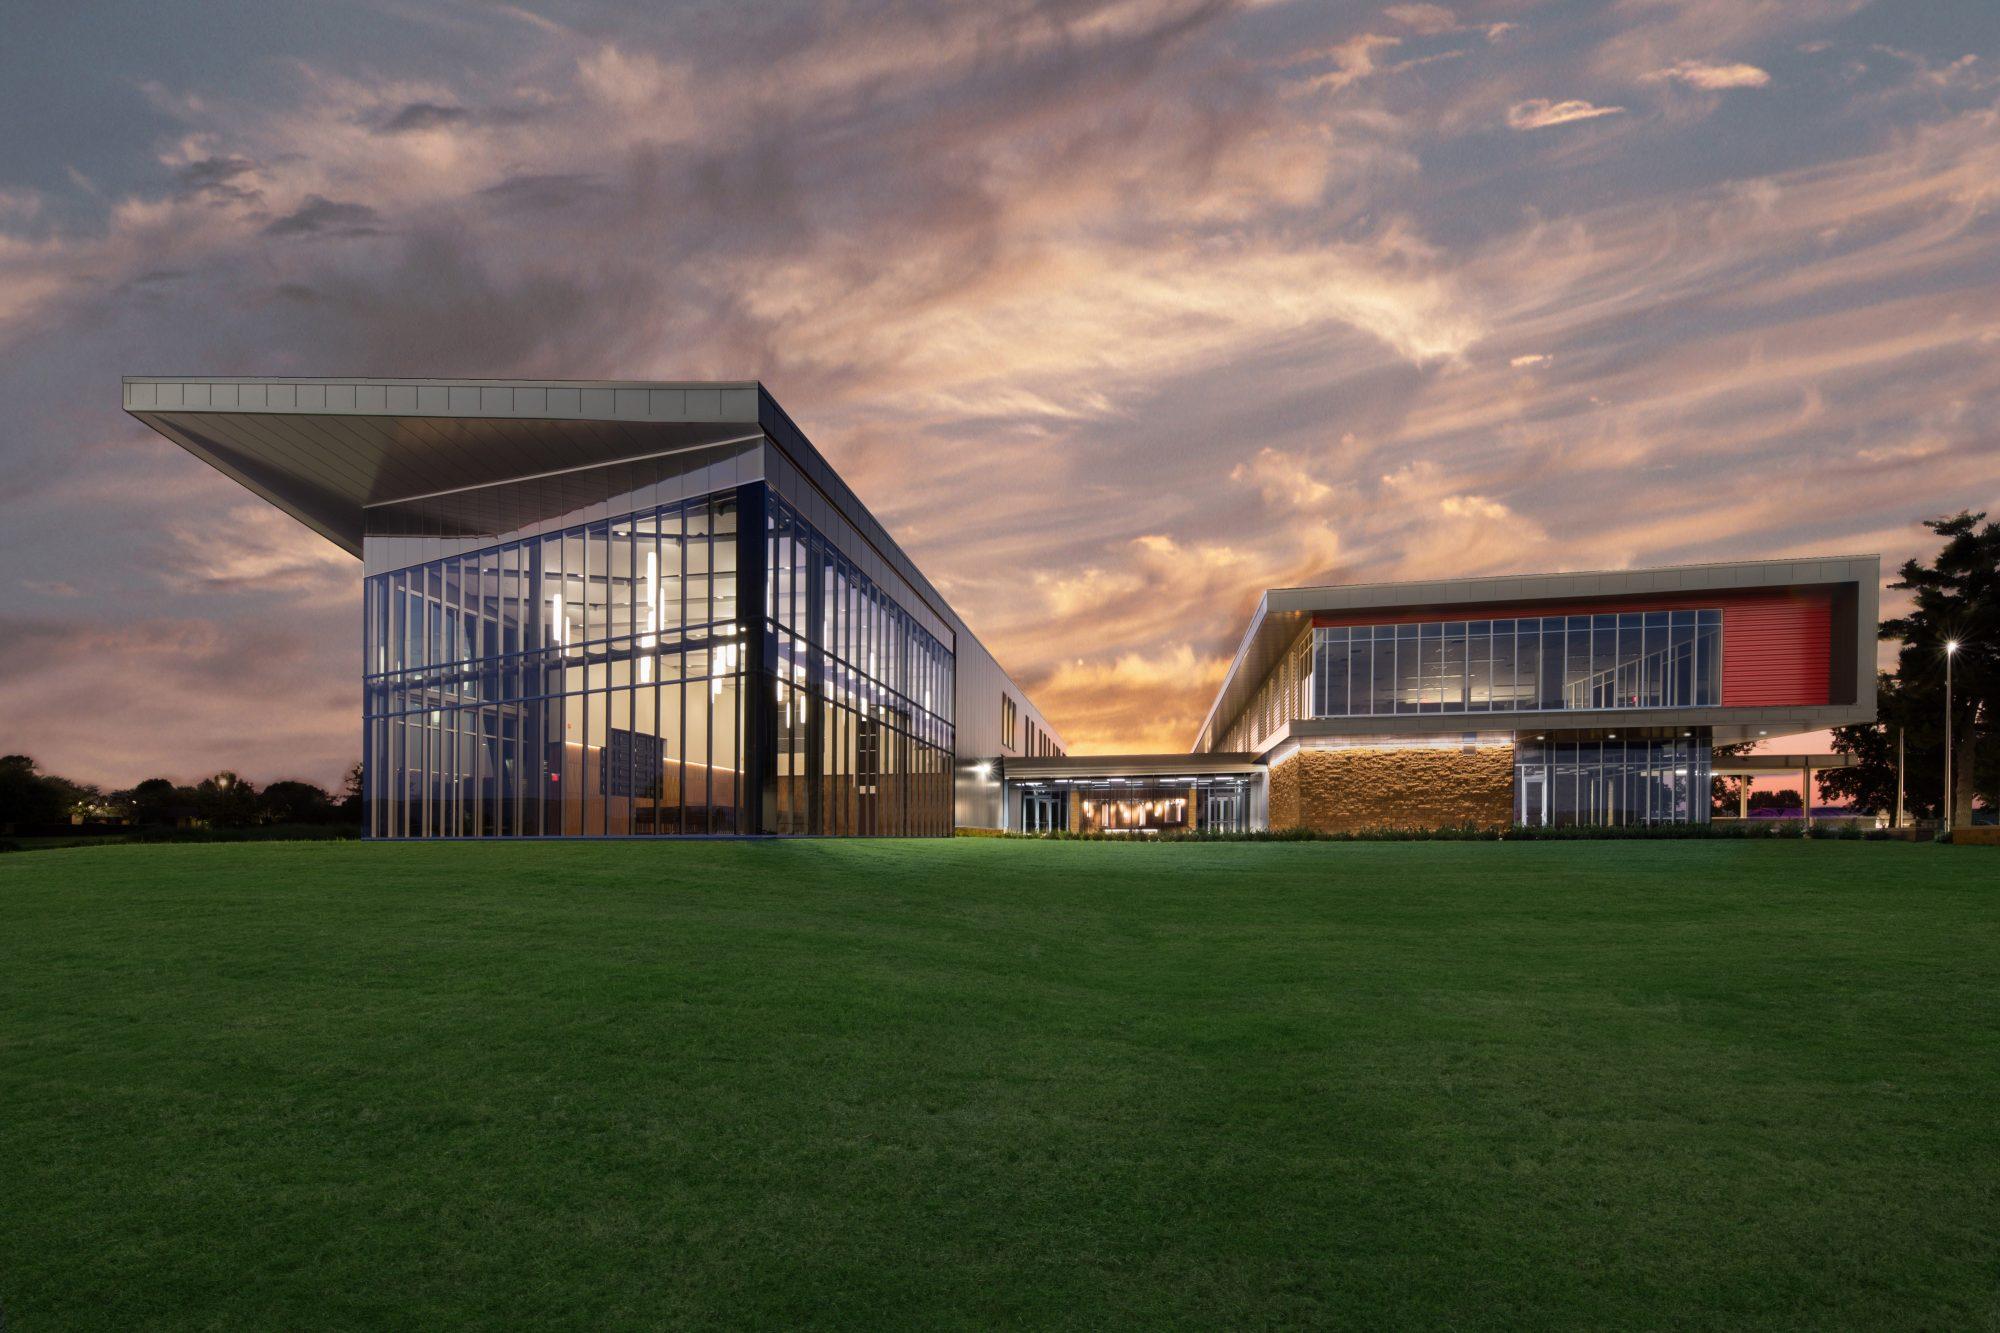 Don Tyson Center for Agricultural Sciences – University of Arkansas